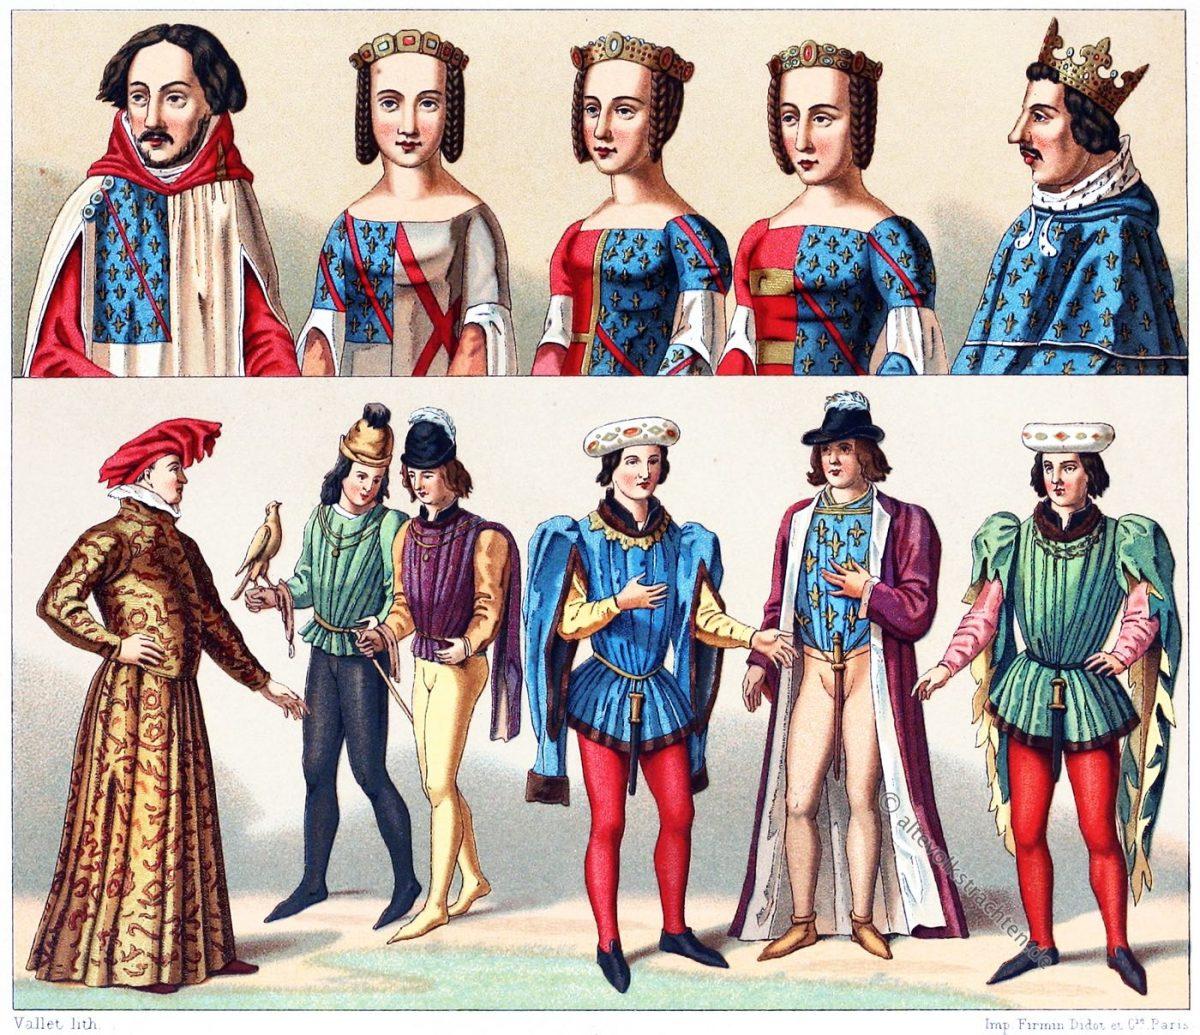 Houpelande, Tappert, Heuke, Mittelalter, Mode, Adel, Kostümgeschichte, Auguste Racinet,